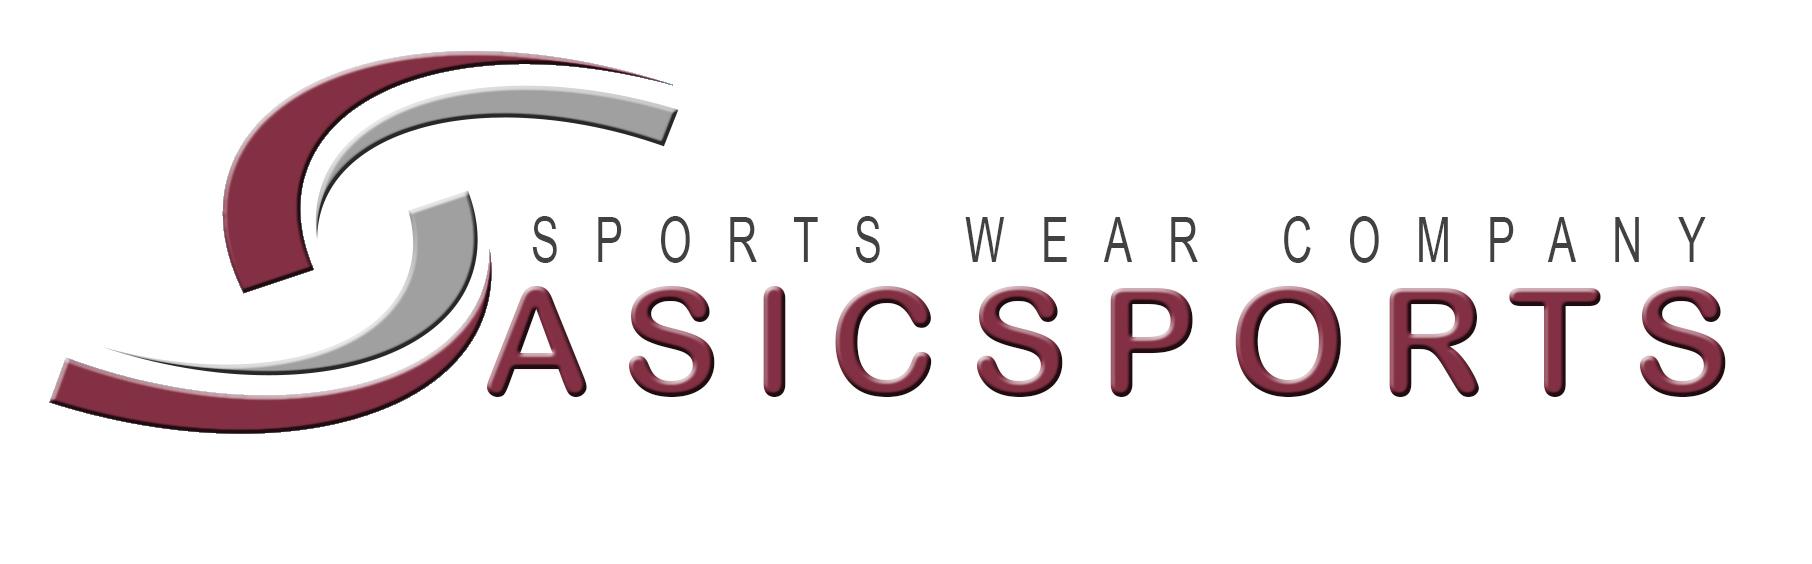 Asic Sports